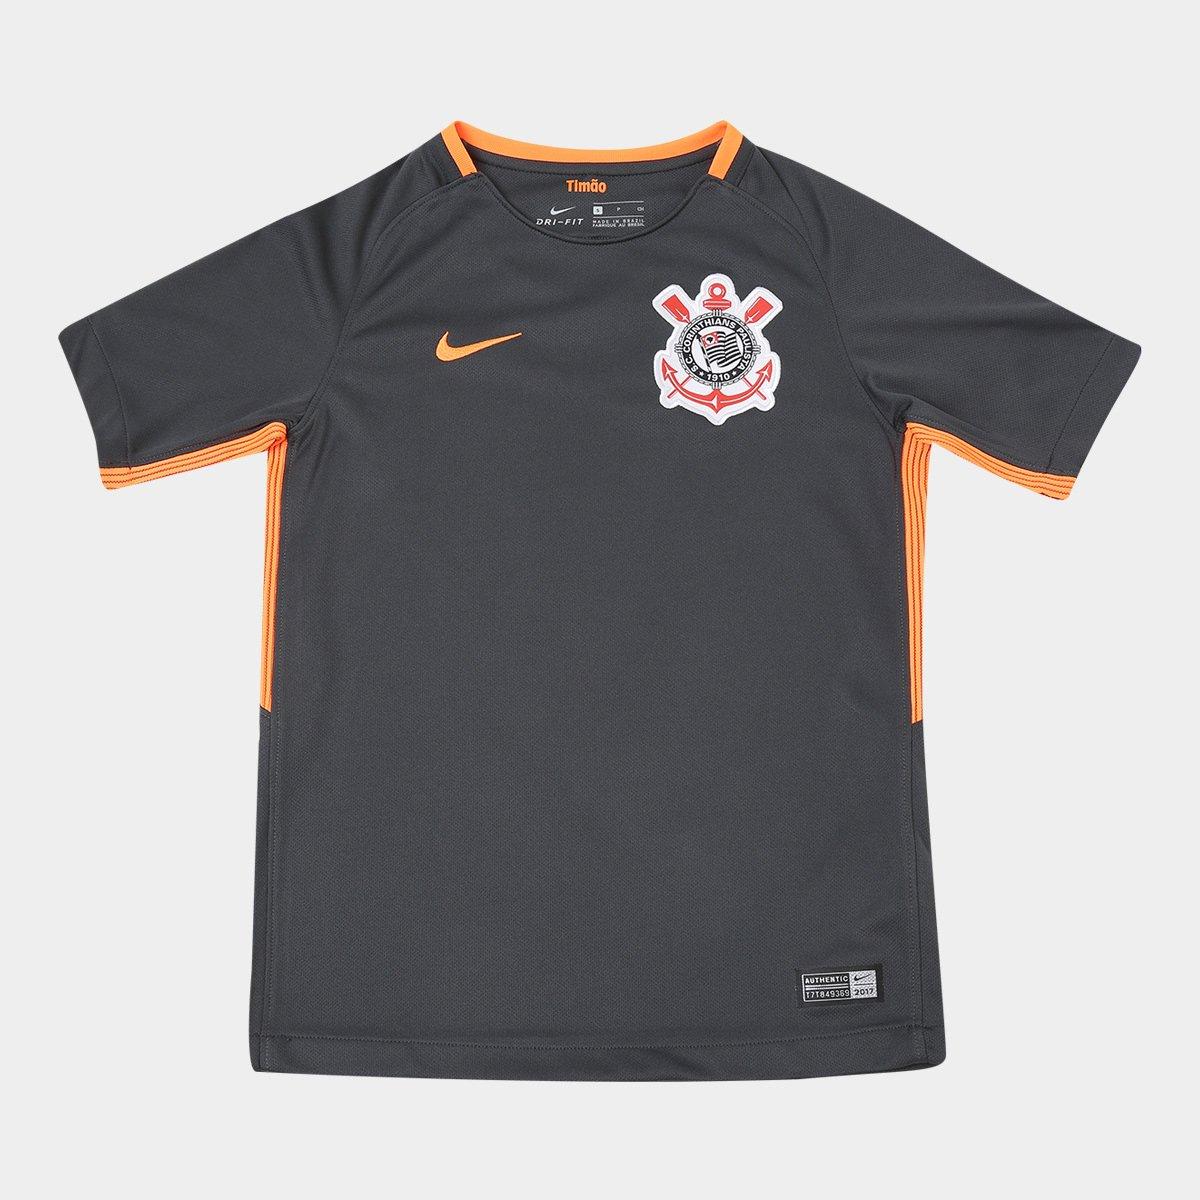 81e9a667f0 Camisa Corinthians Juvenil III 17 18 s n° - Torcedor Nike - Compre ...